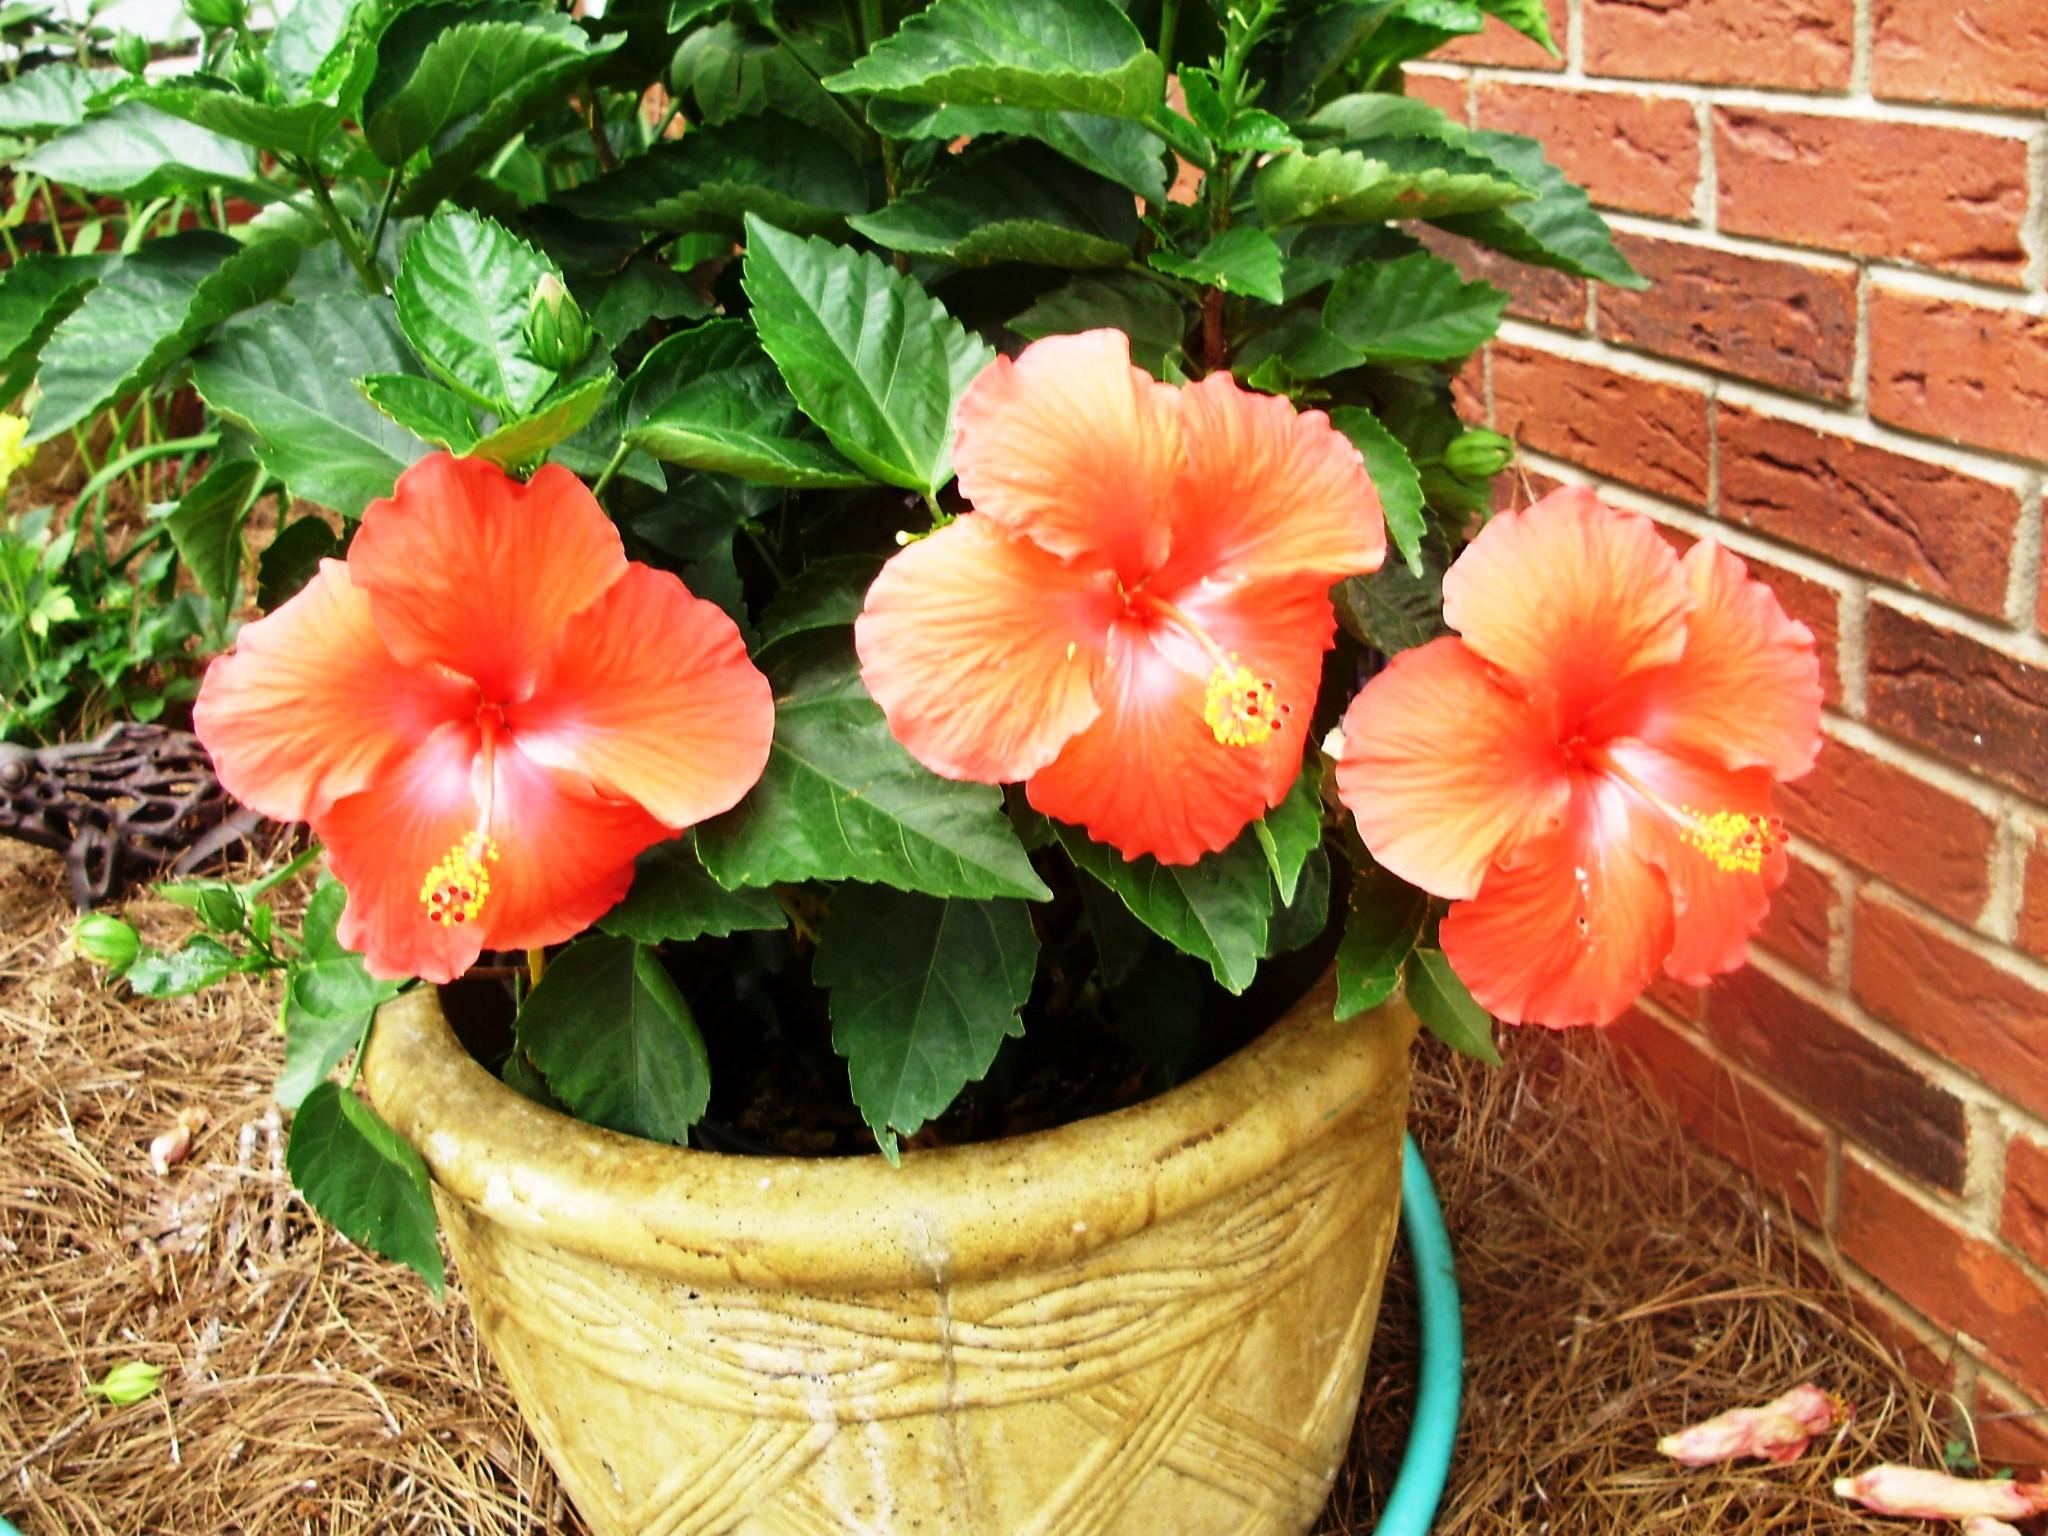 Beauty in nature allinthedayofme hibiscus izmirmasajfo